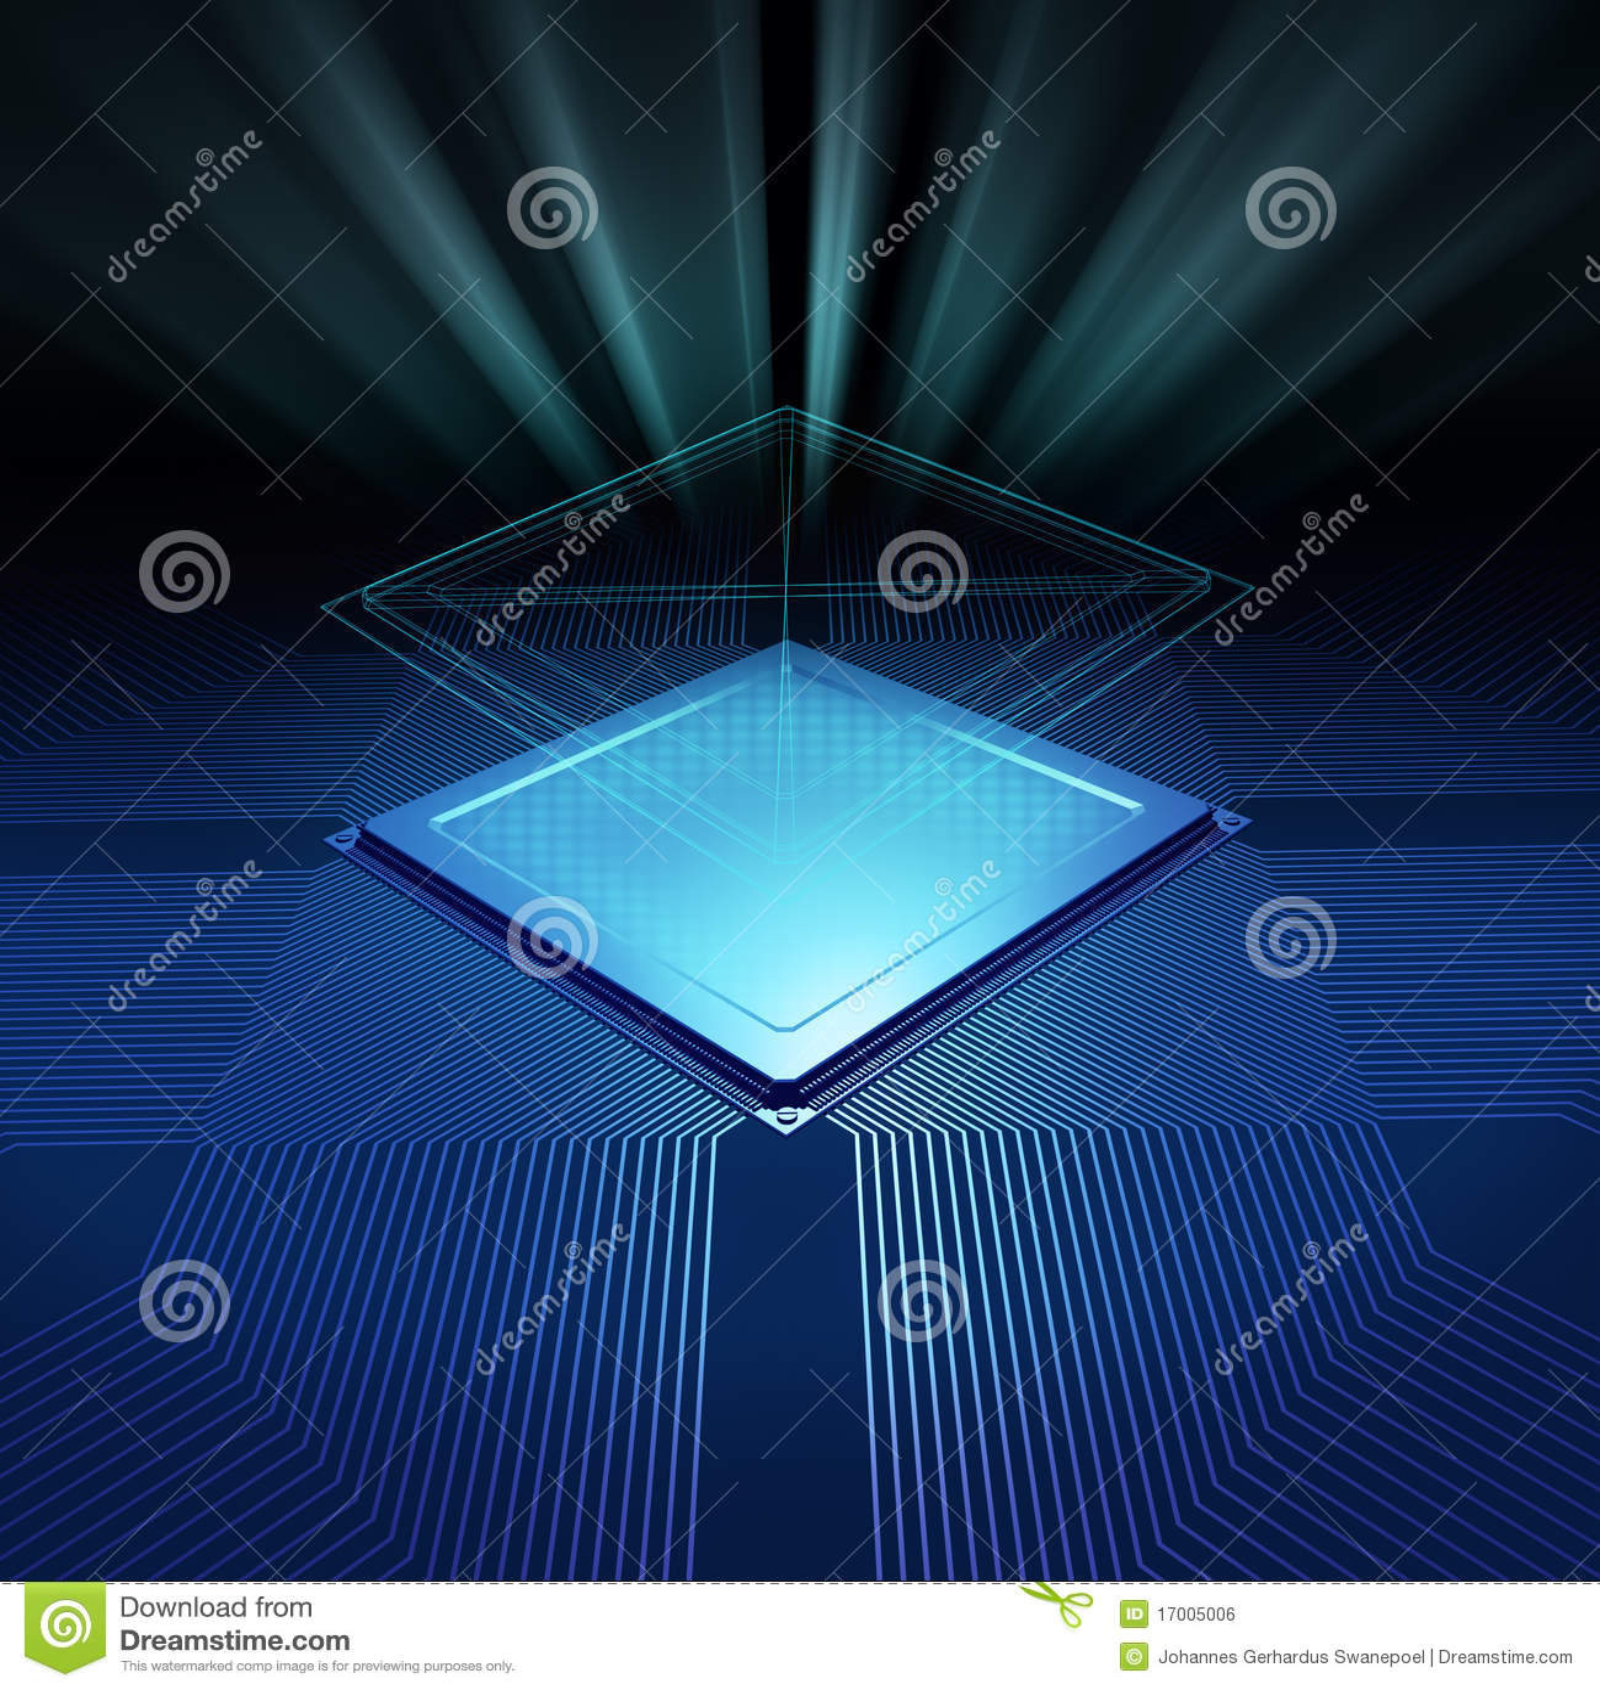 Cpu background stock photo Image of beam electronic